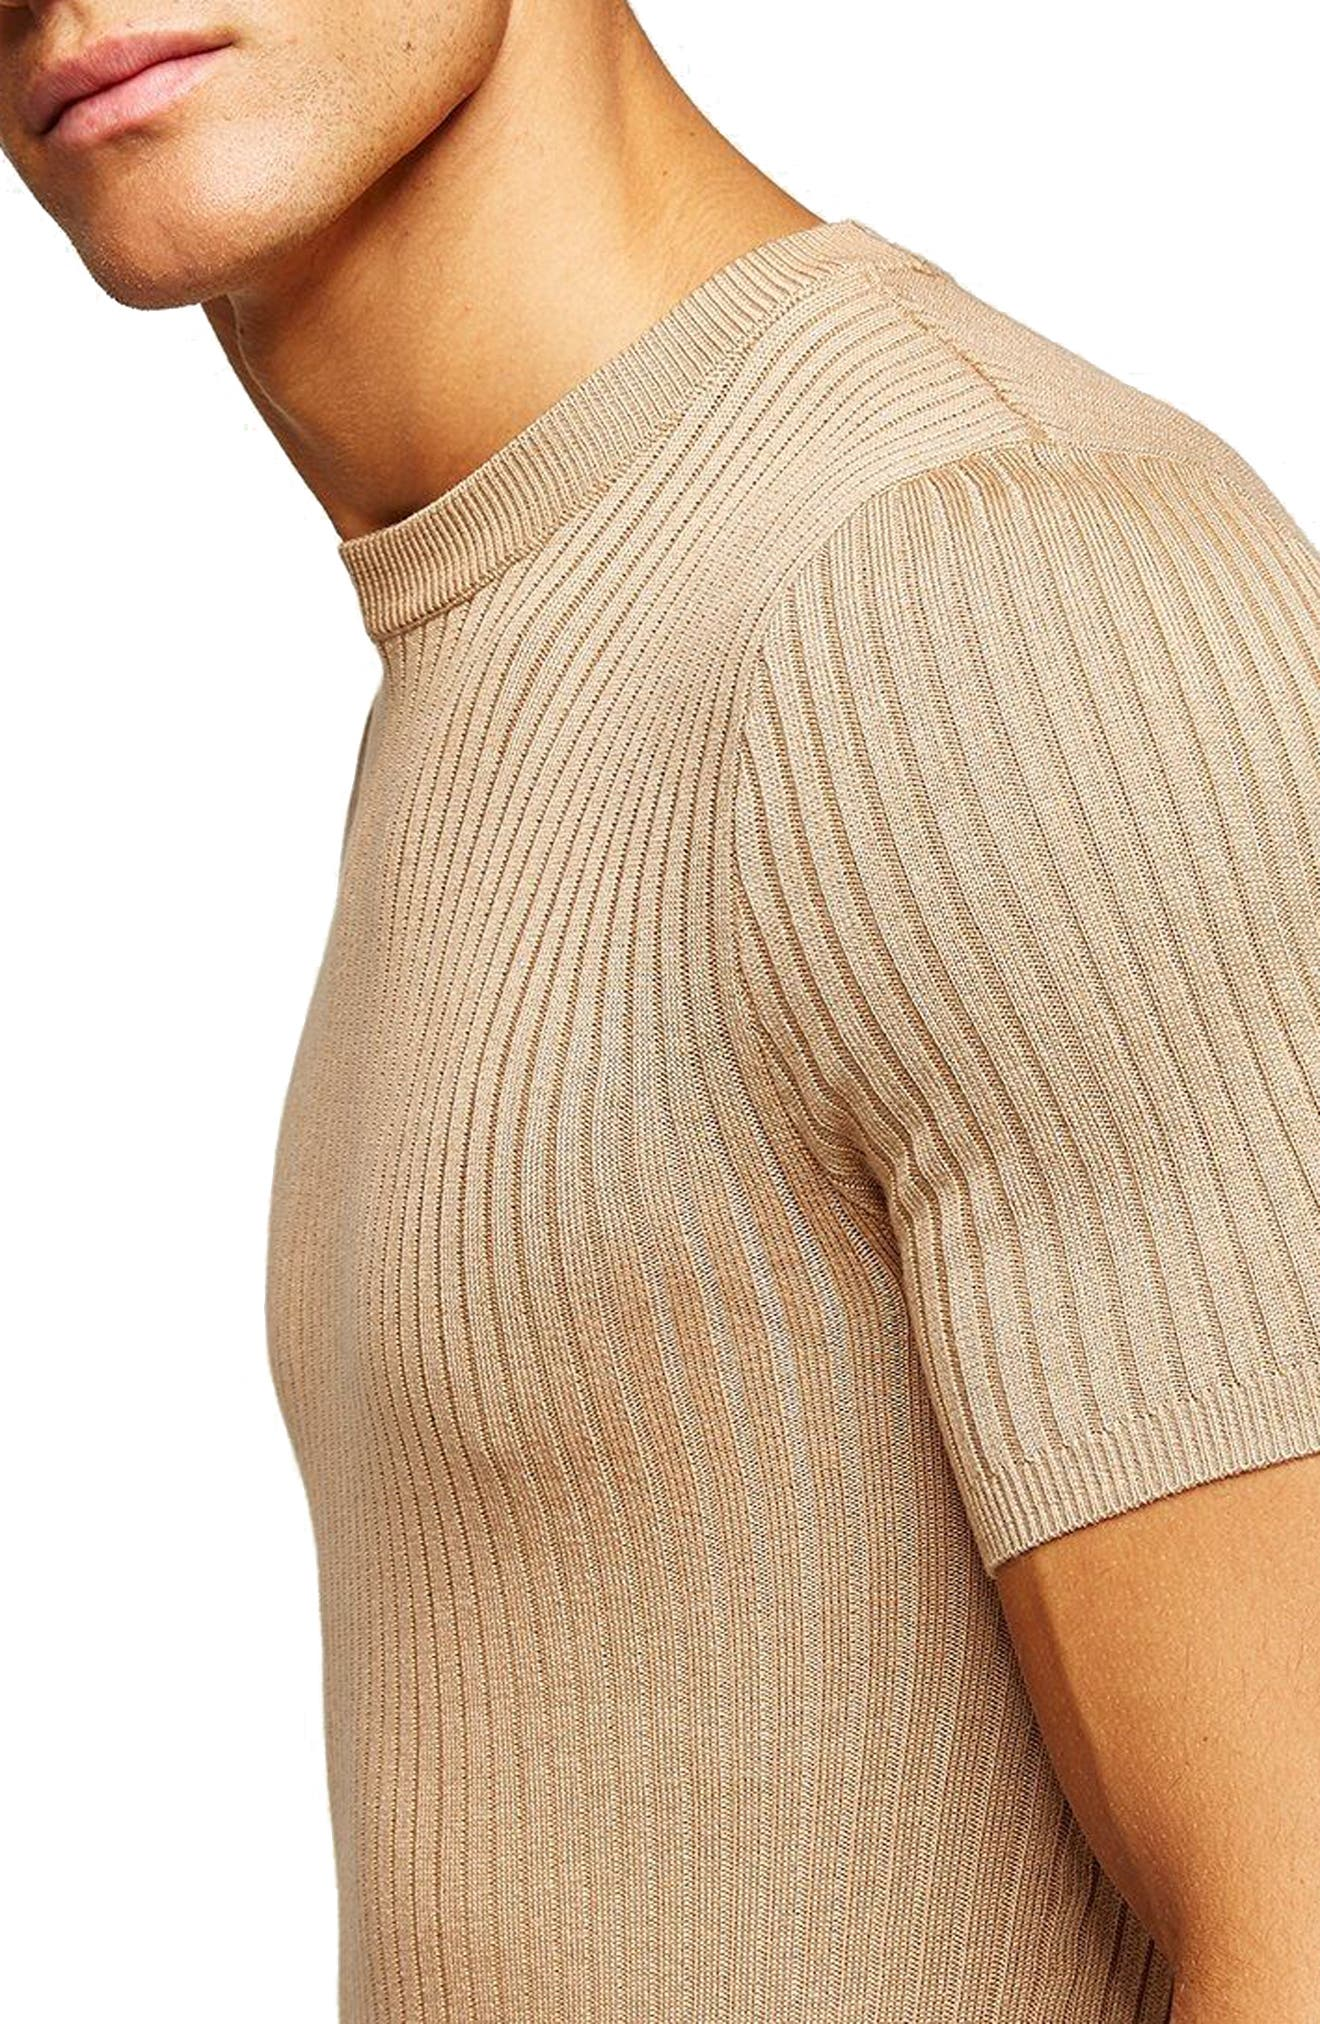 Short Sleeve Muscle Fit Shirt,                             Alternate thumbnail 3, color,                             250